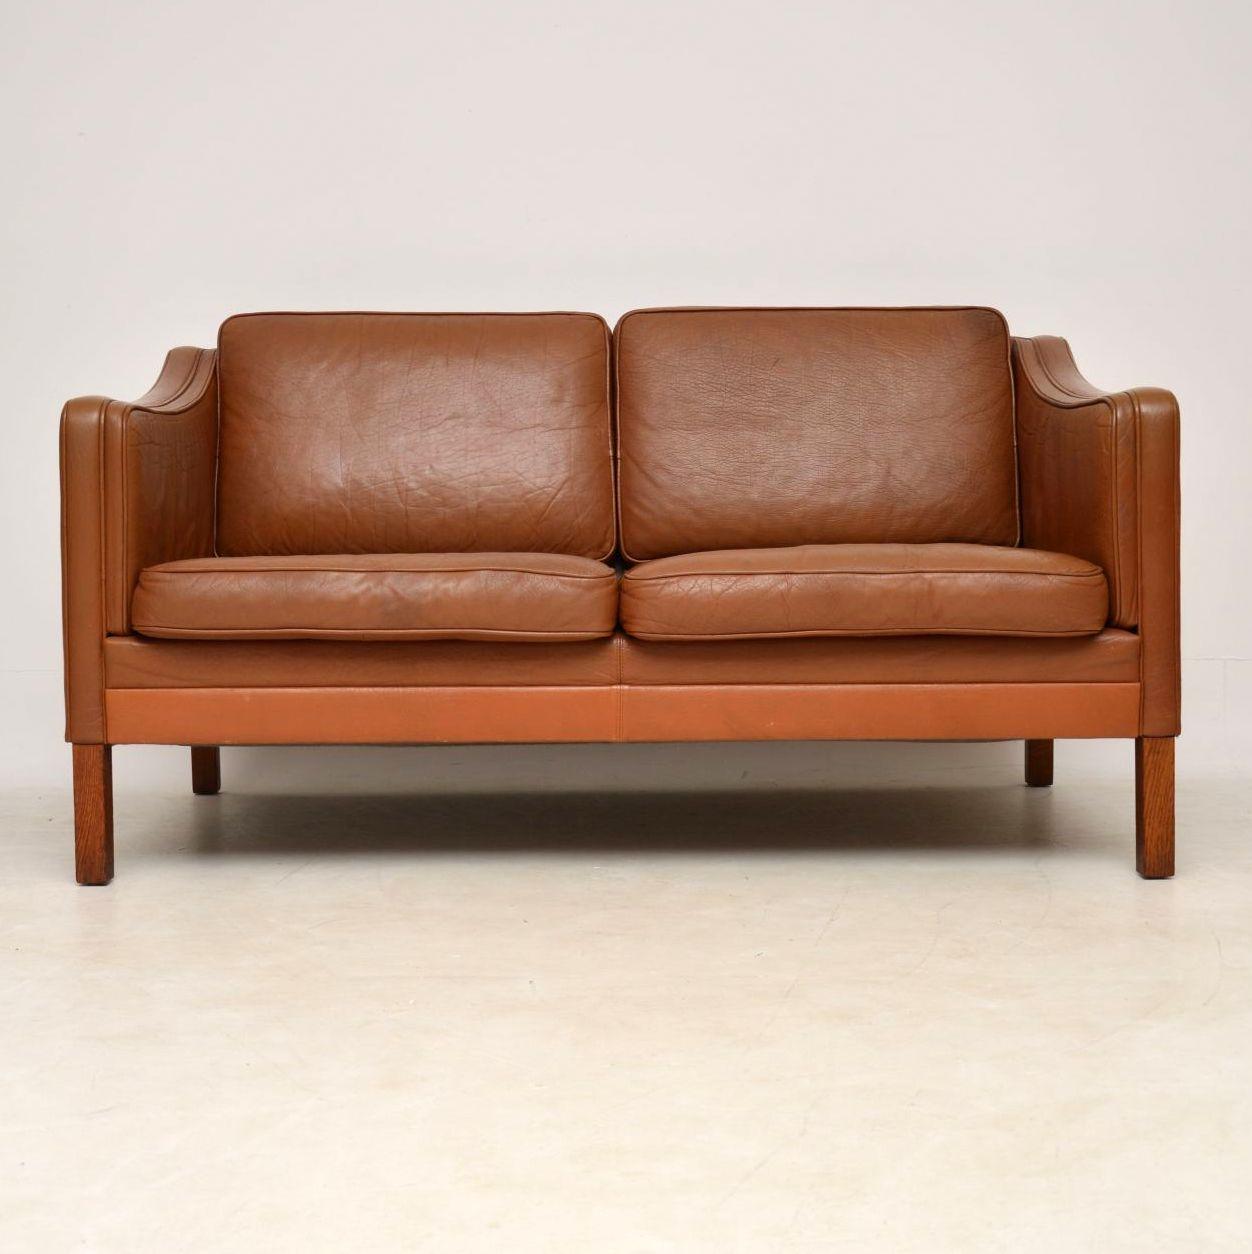 danish leather vintage retro two seat sofa